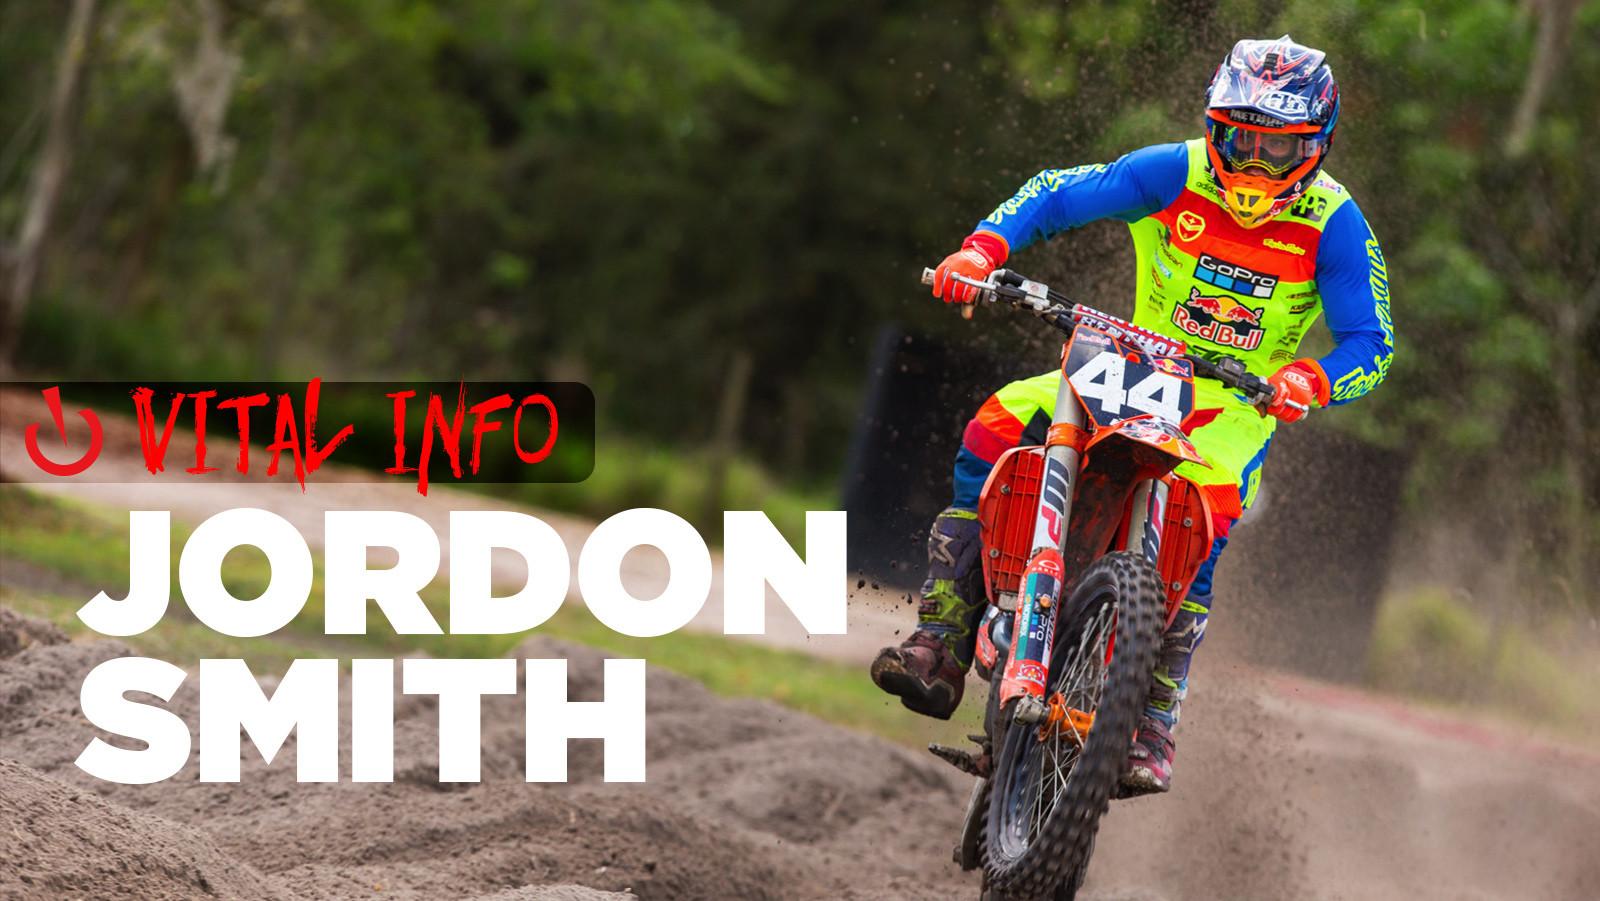 Vital Info: Jordon Smith